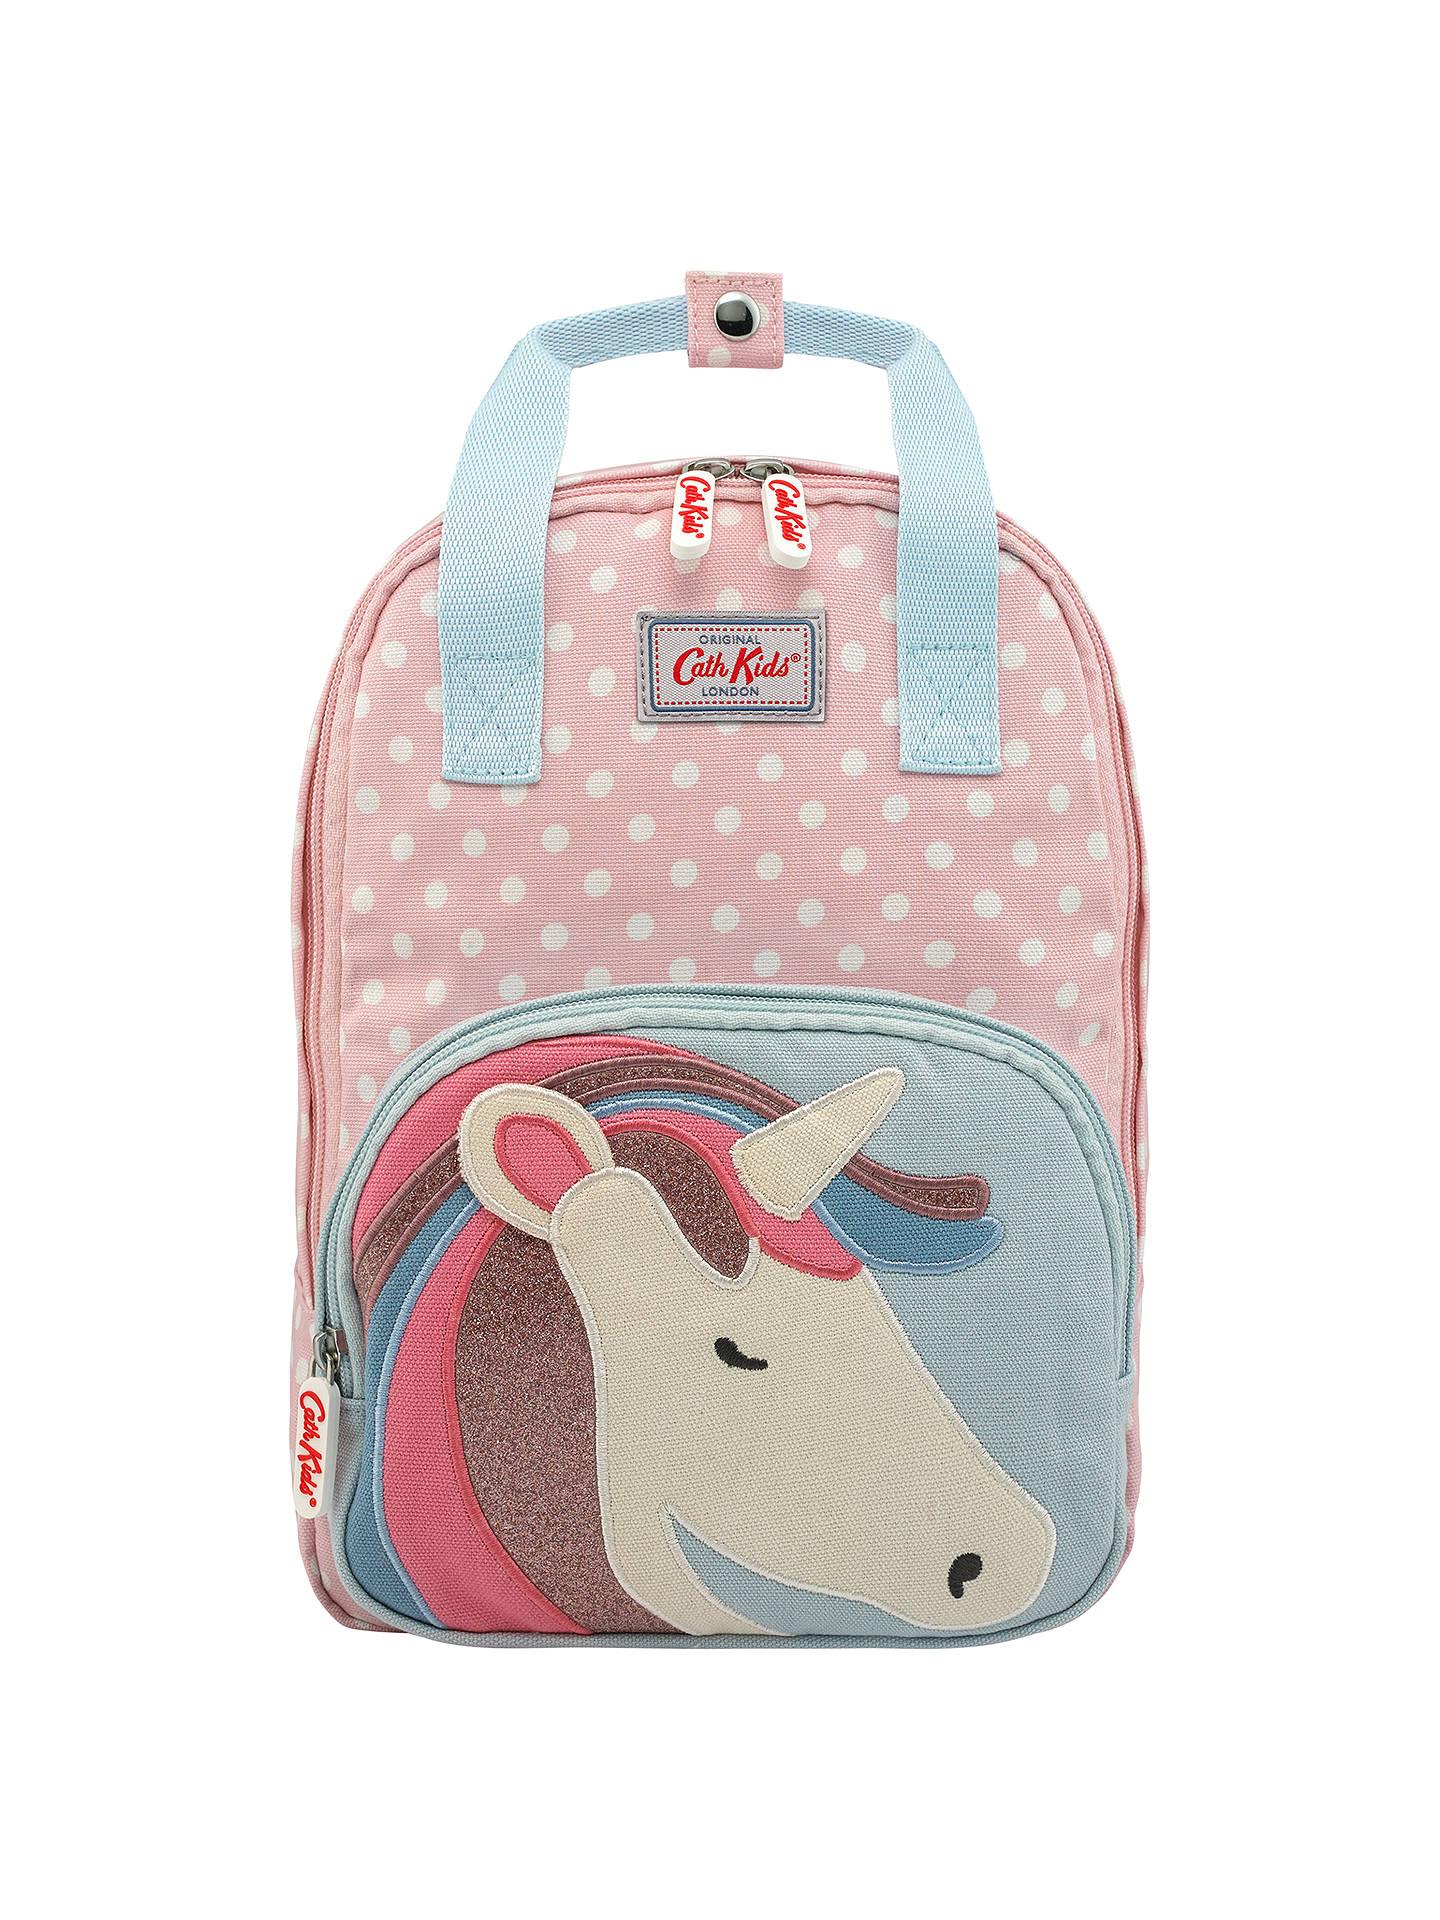 Children's Unicorn Backpack Rucksack